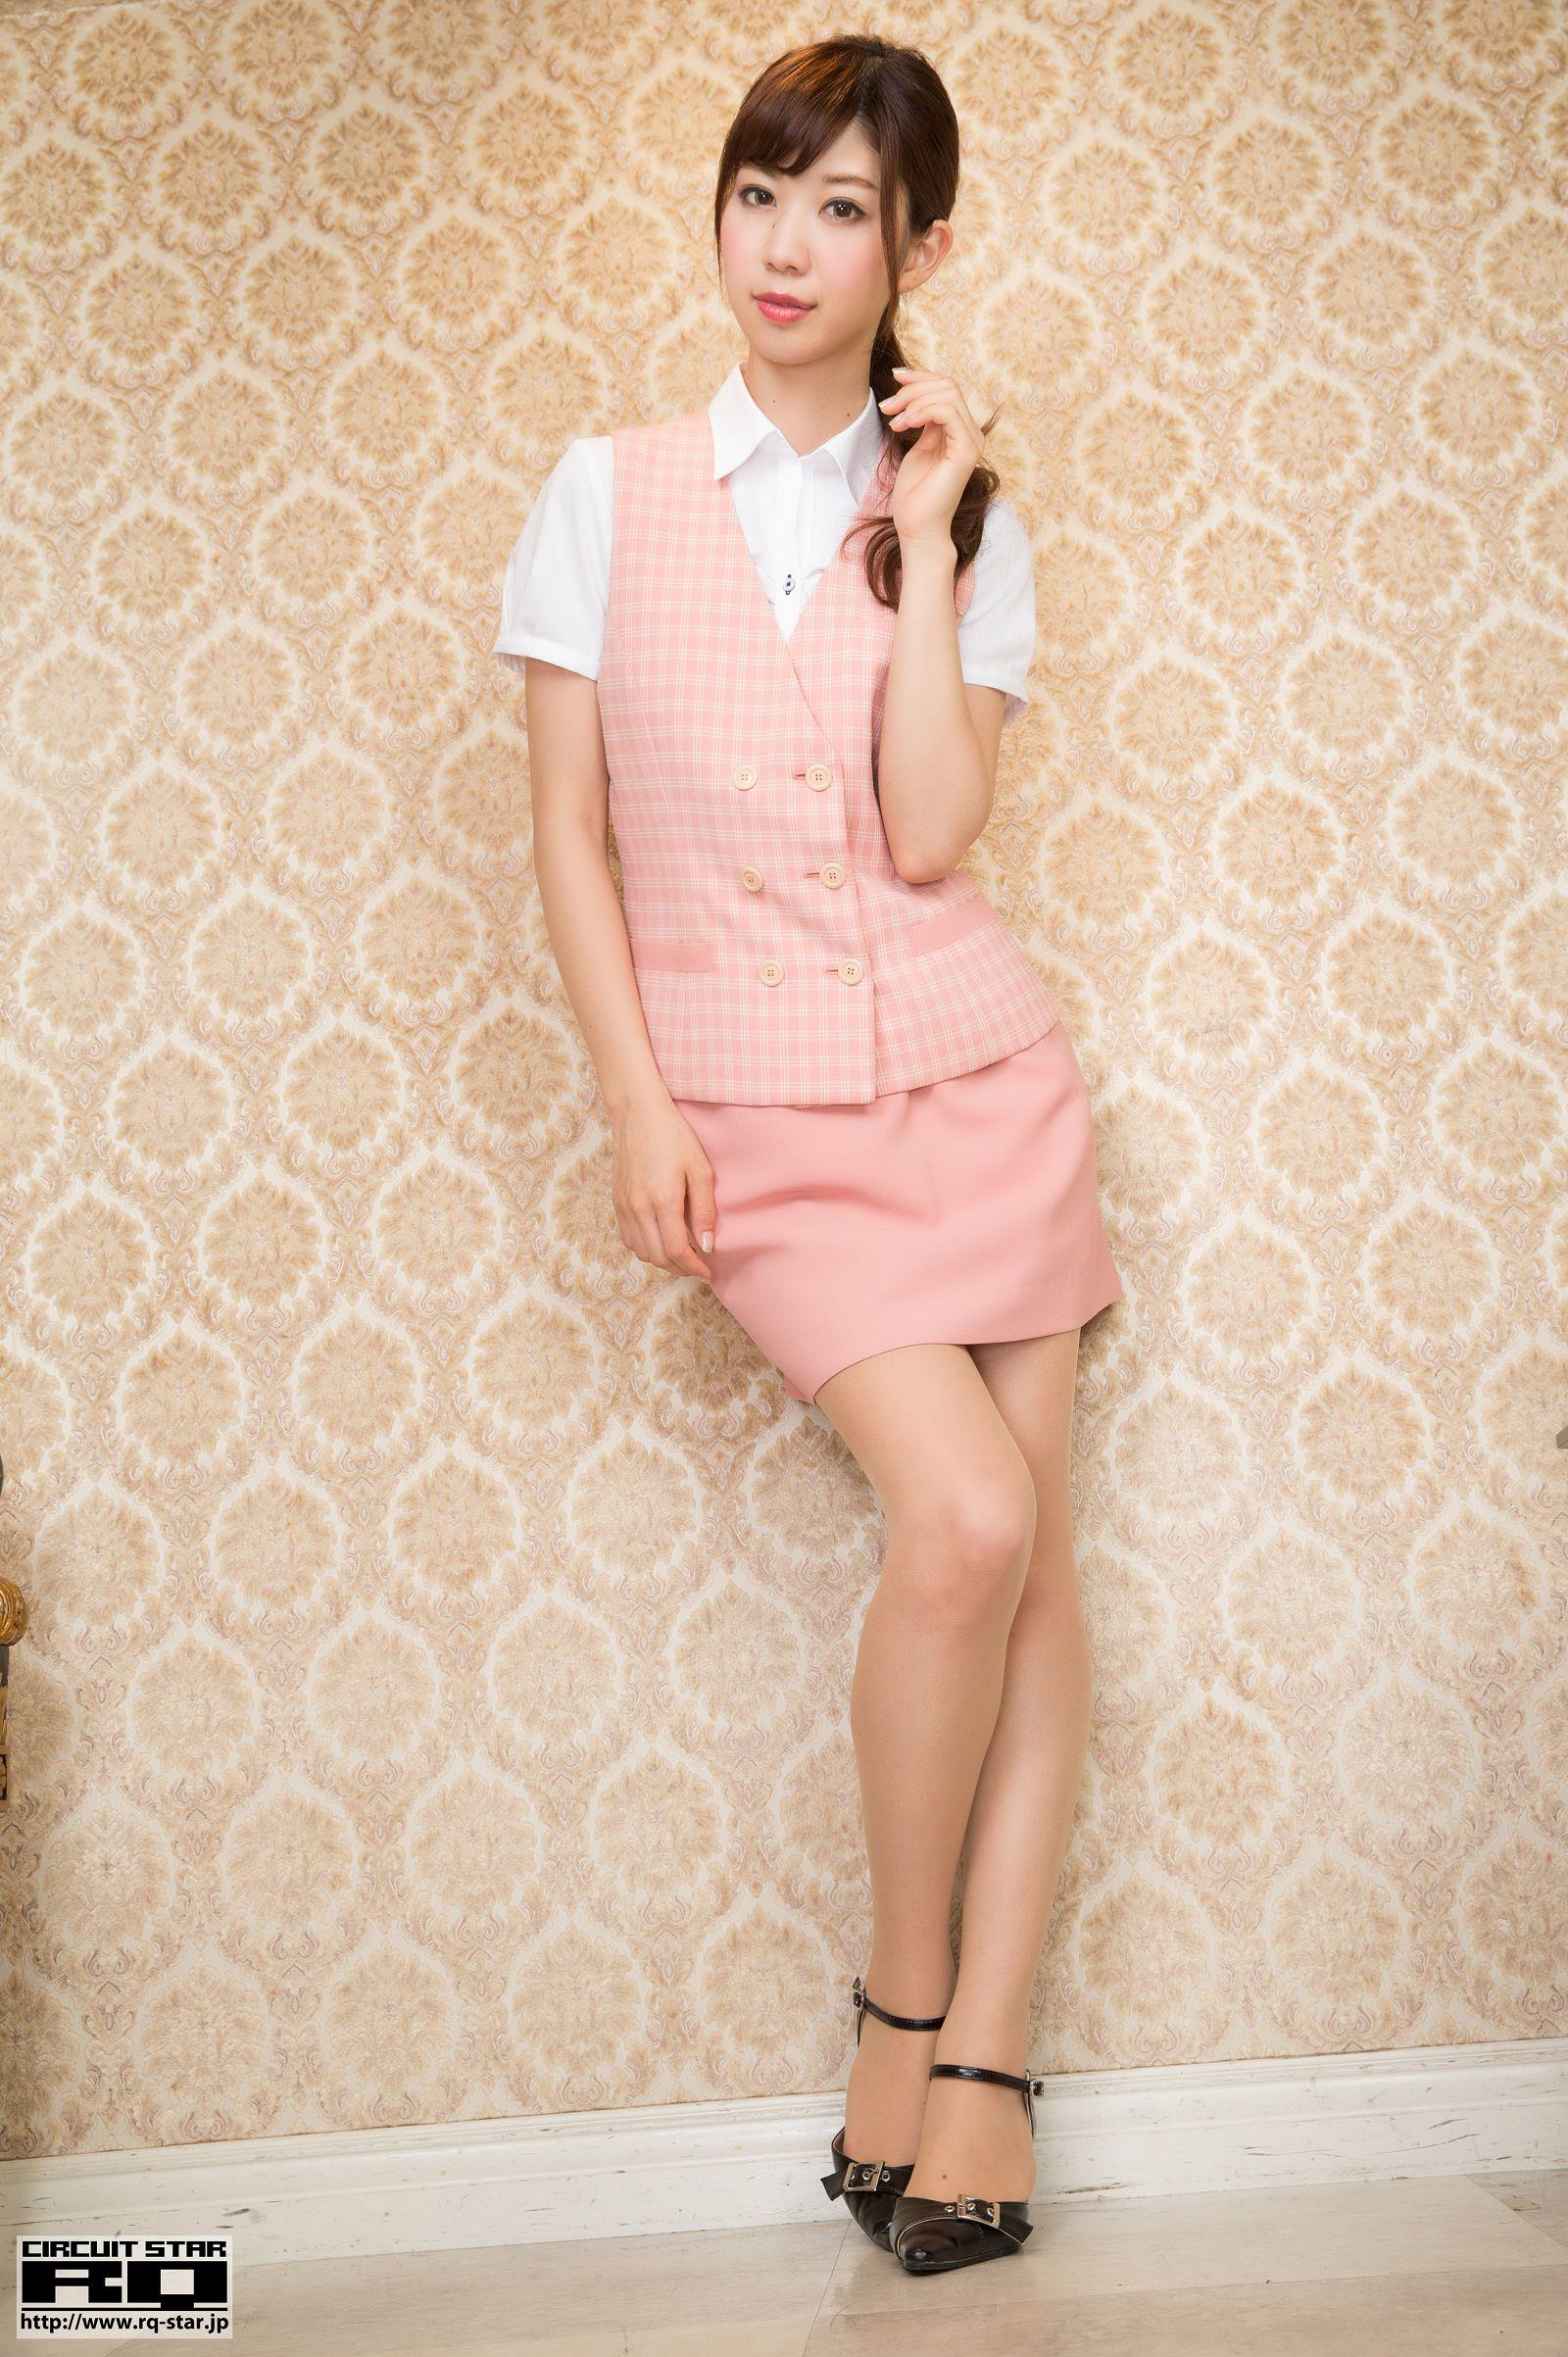 [RQ STAR美女] NO.01044 Chimu ちむ Office Lady[90P] RQ STAR 第4张